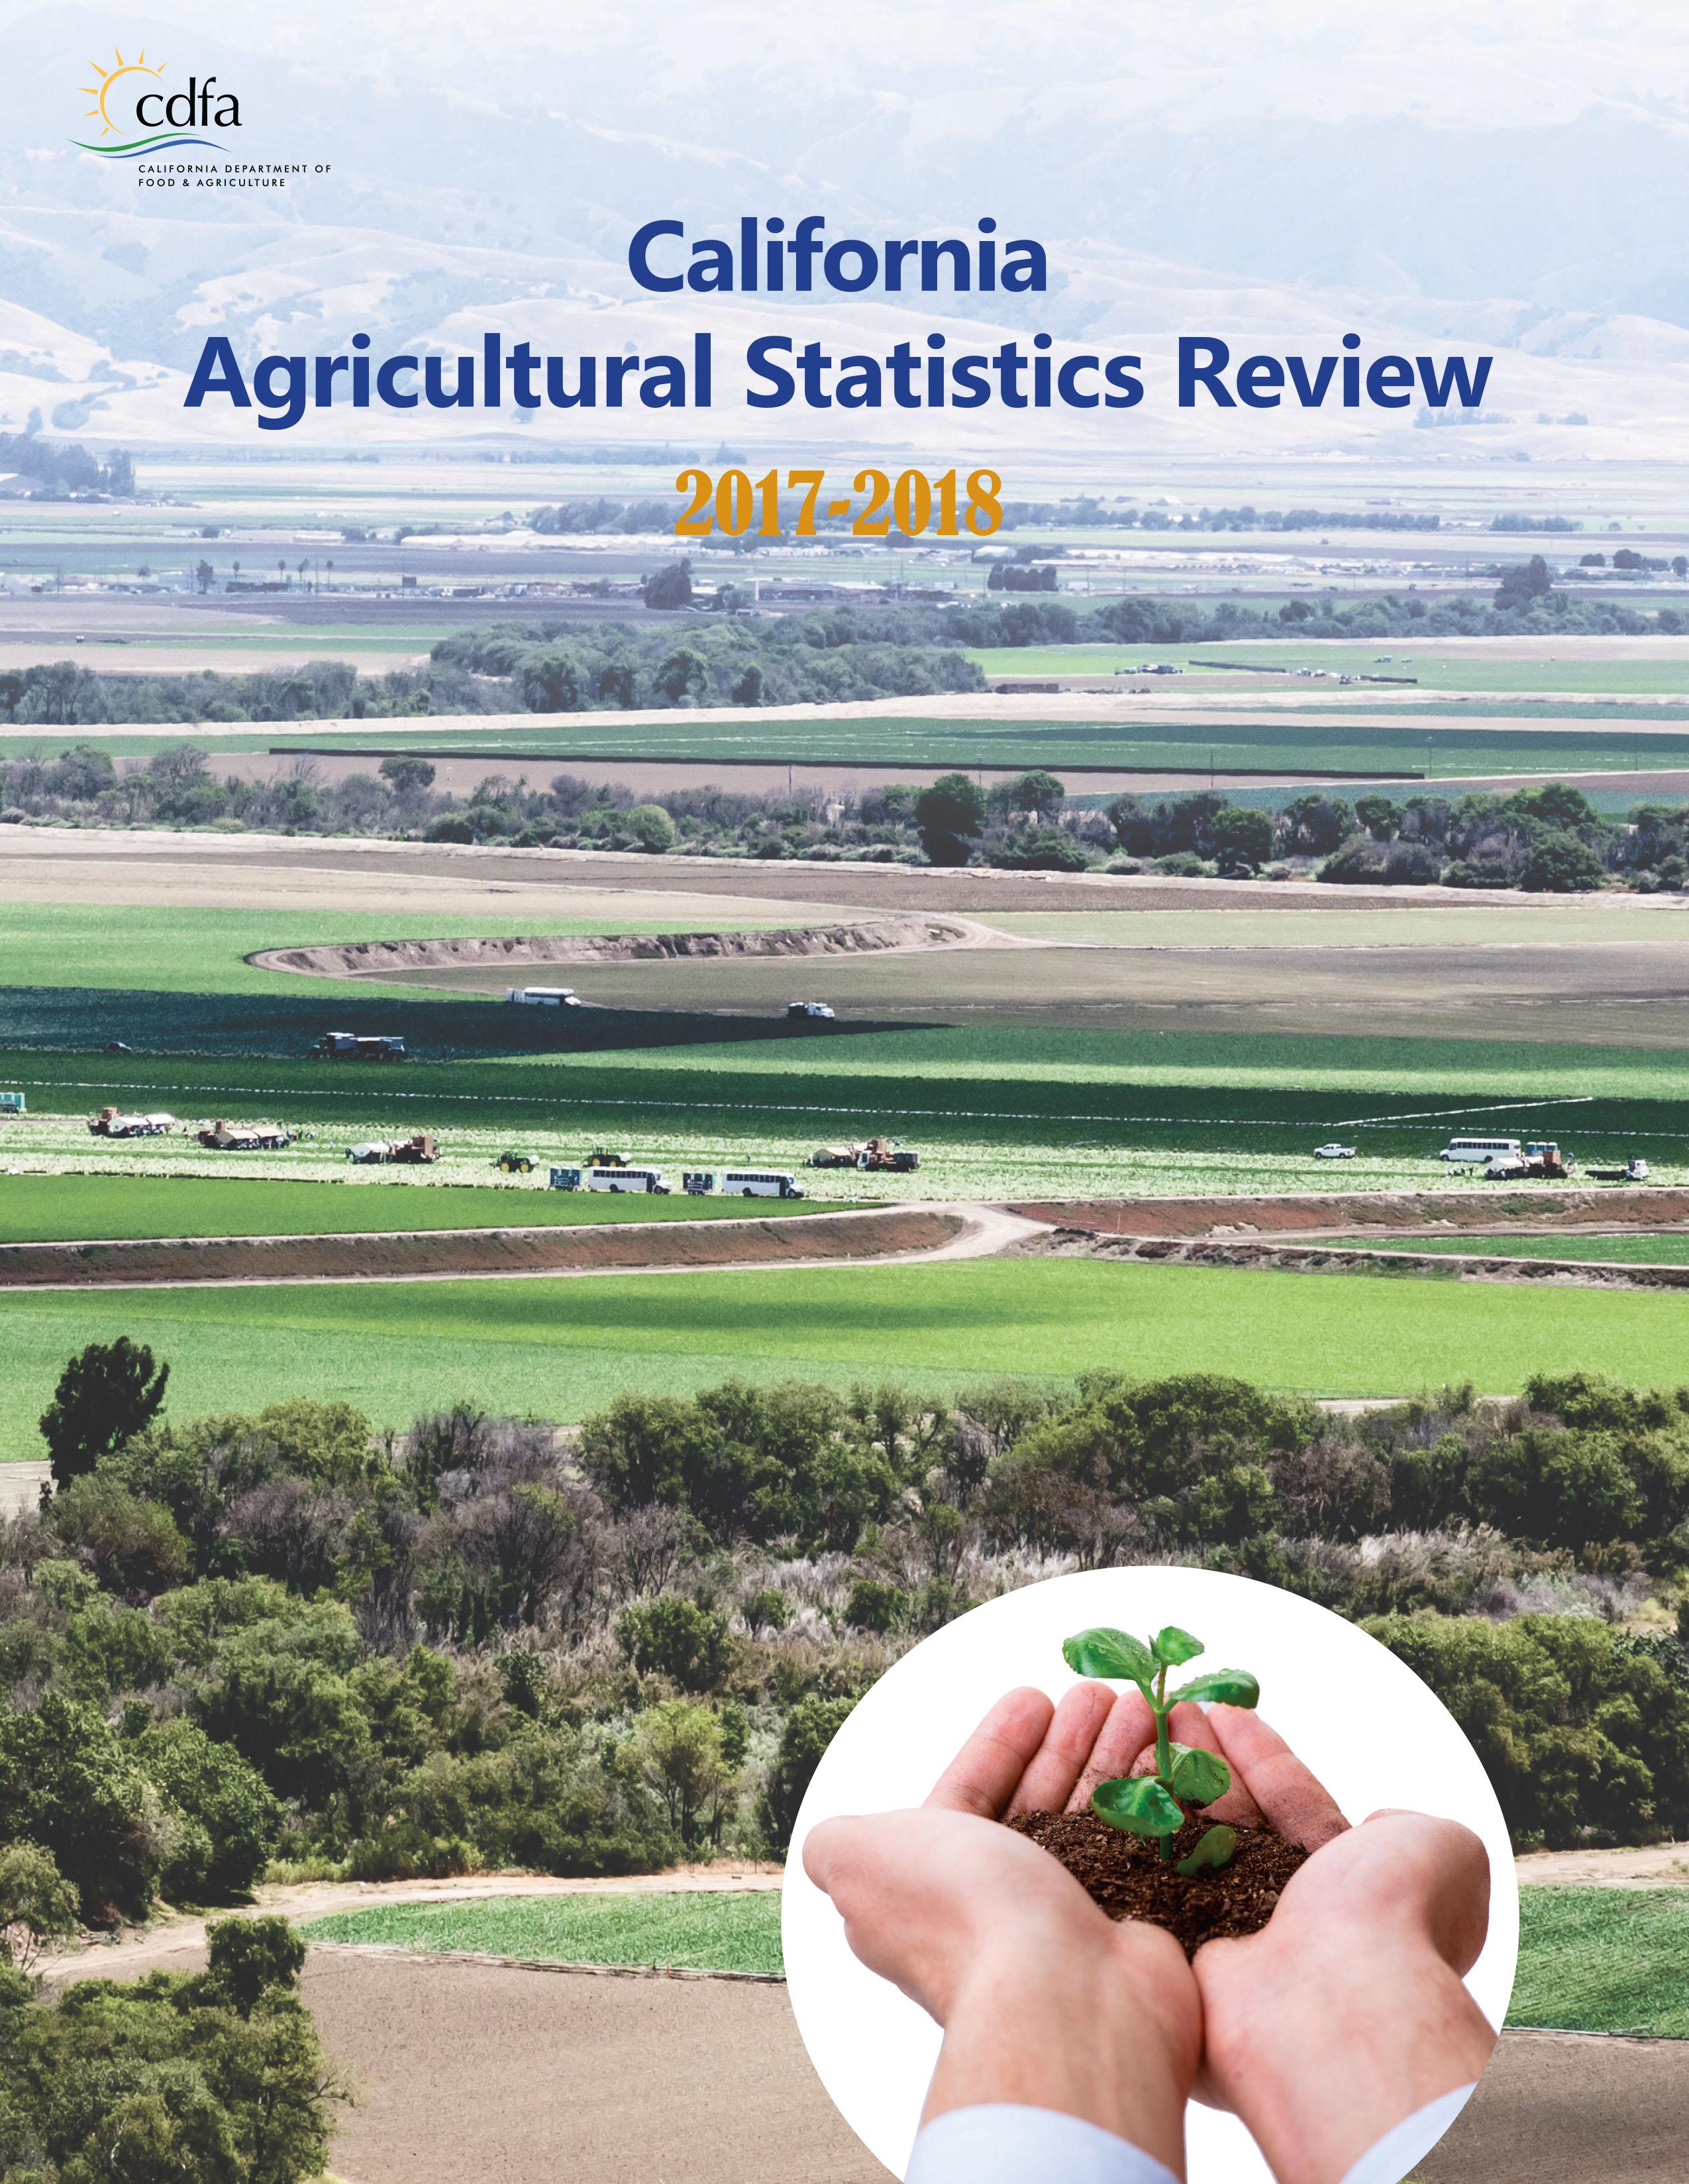 CDFA - Statistics